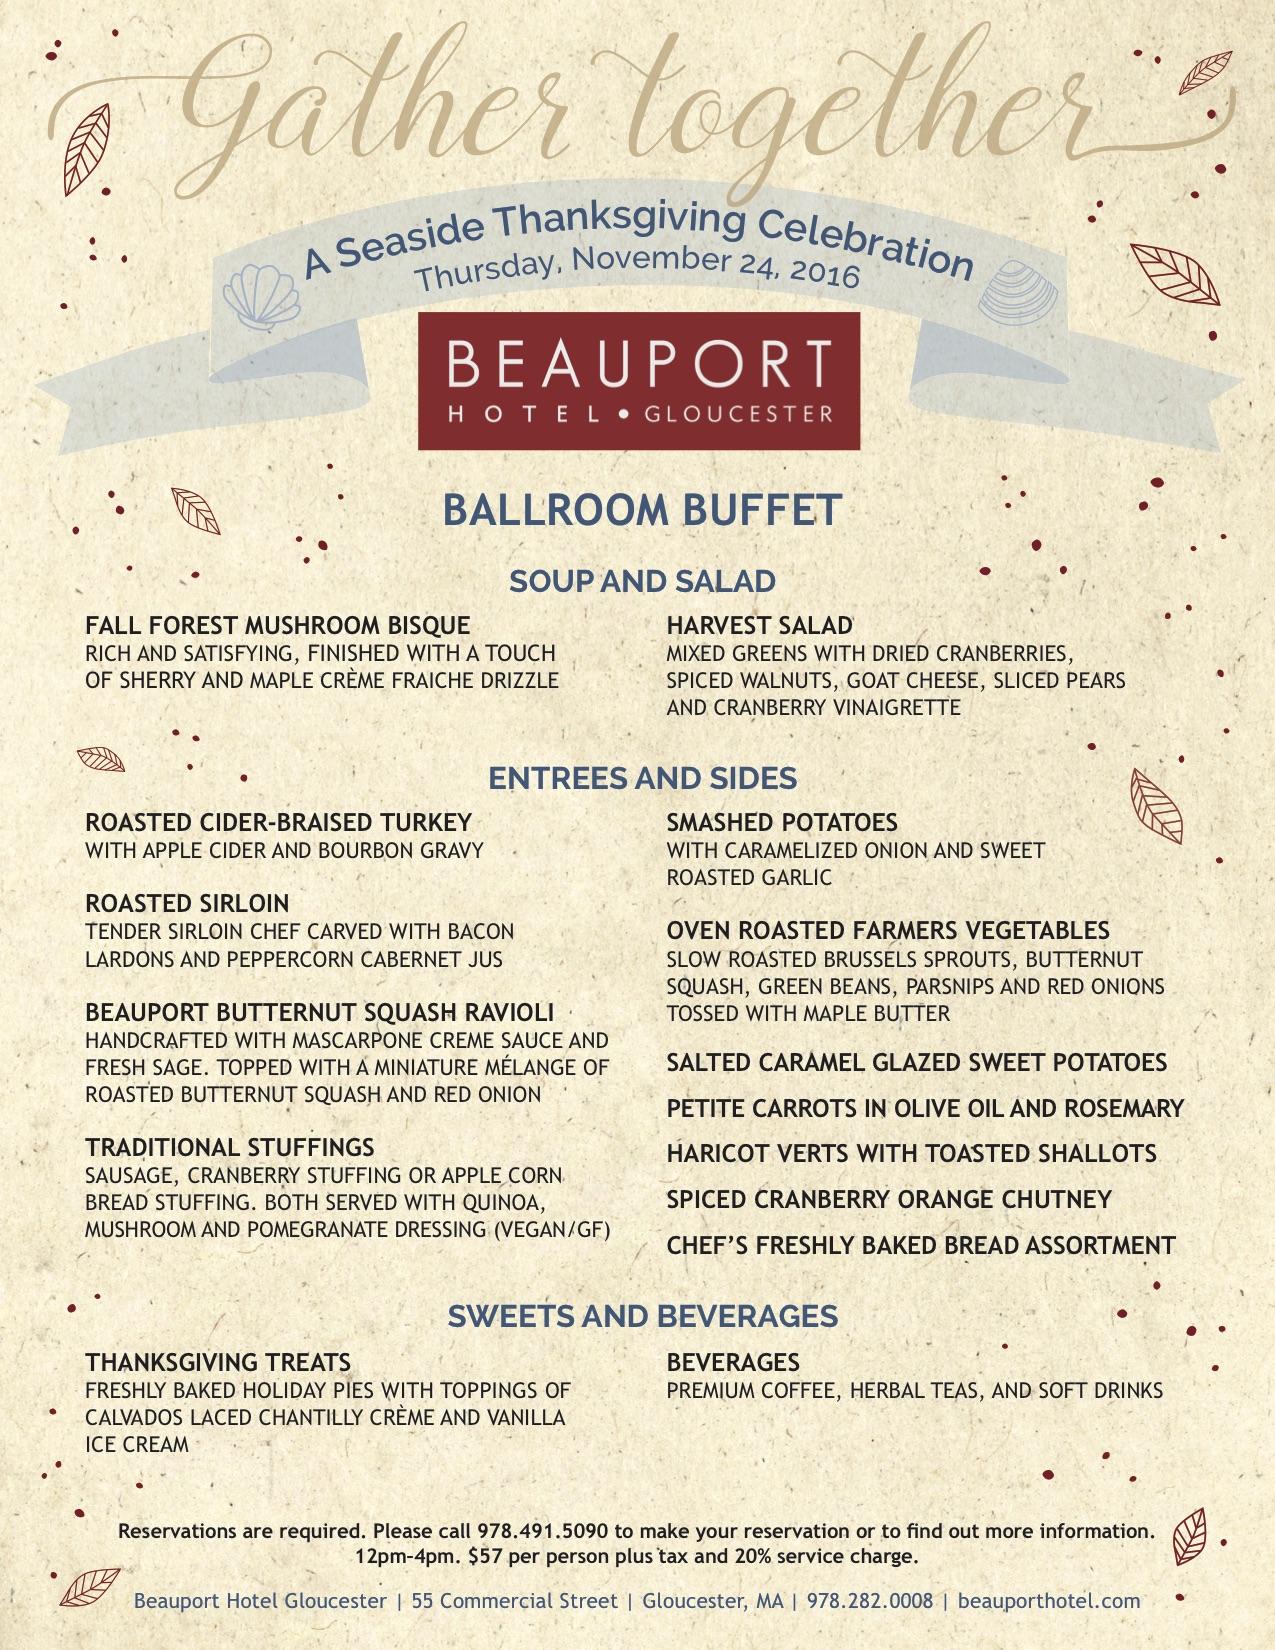 Beauport Hotel Thanksgiving Menus | capeanneats